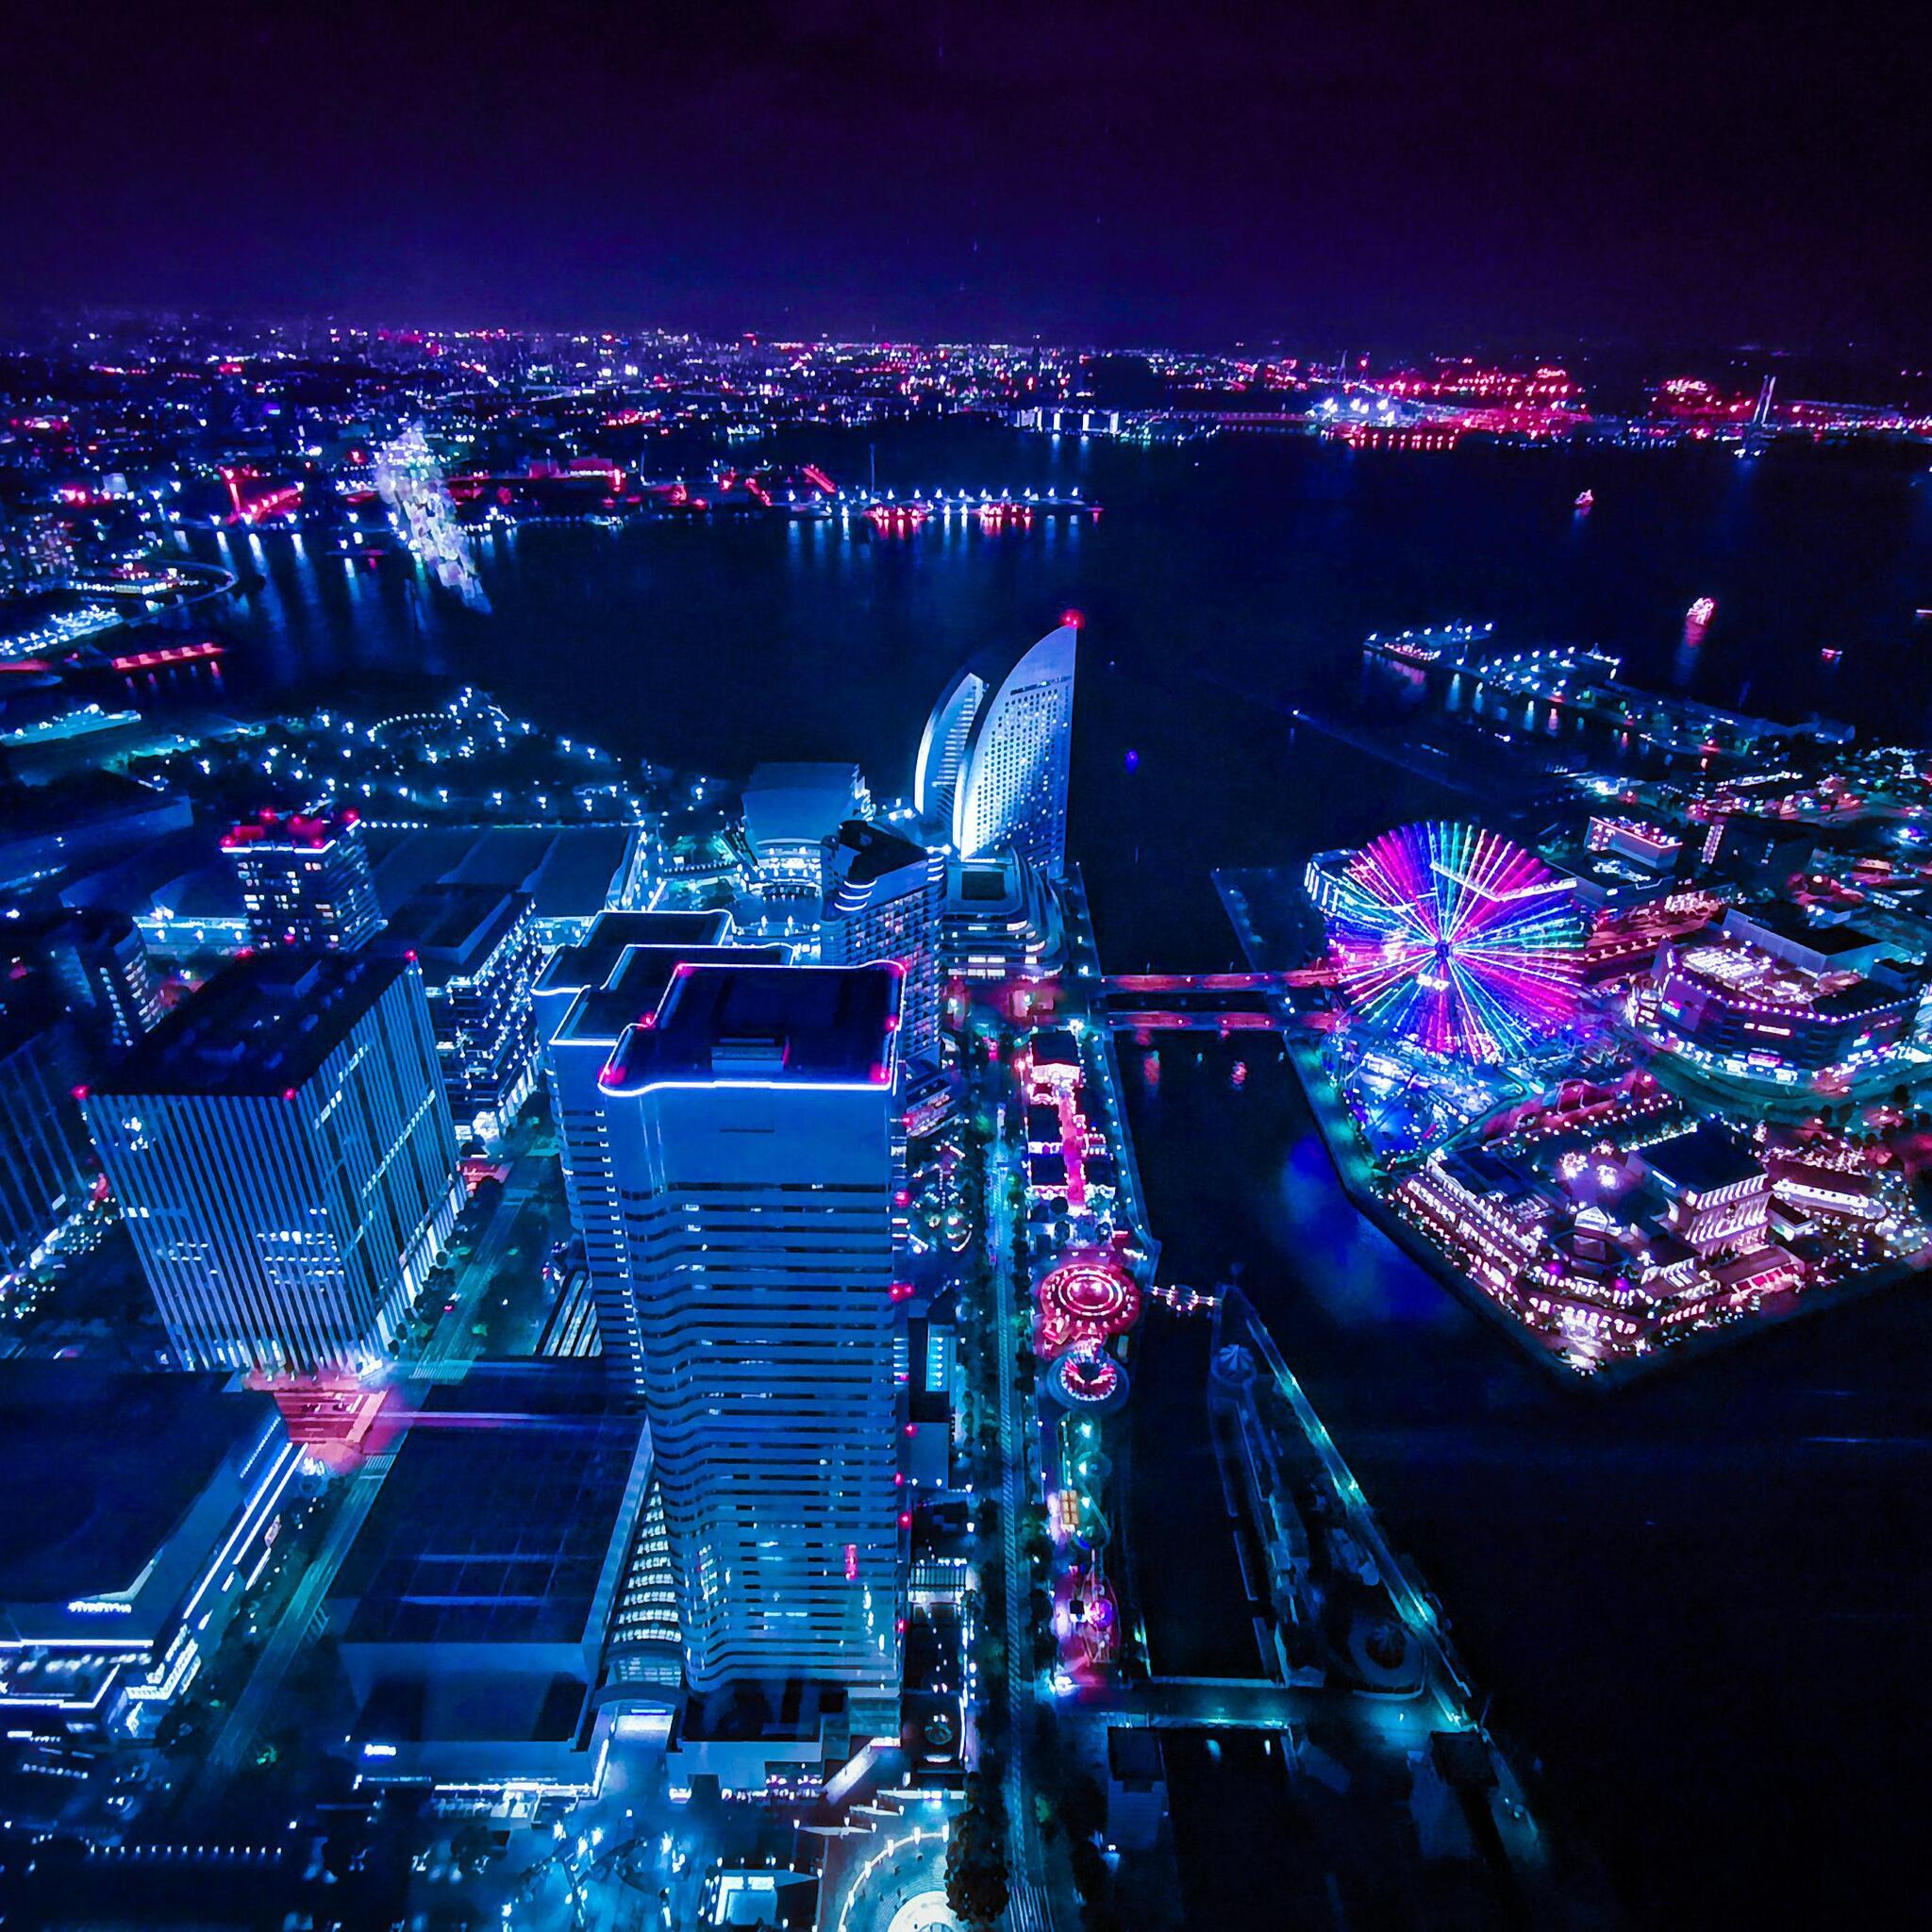 yokohama-at-night-noen-city-4k-00.jpg